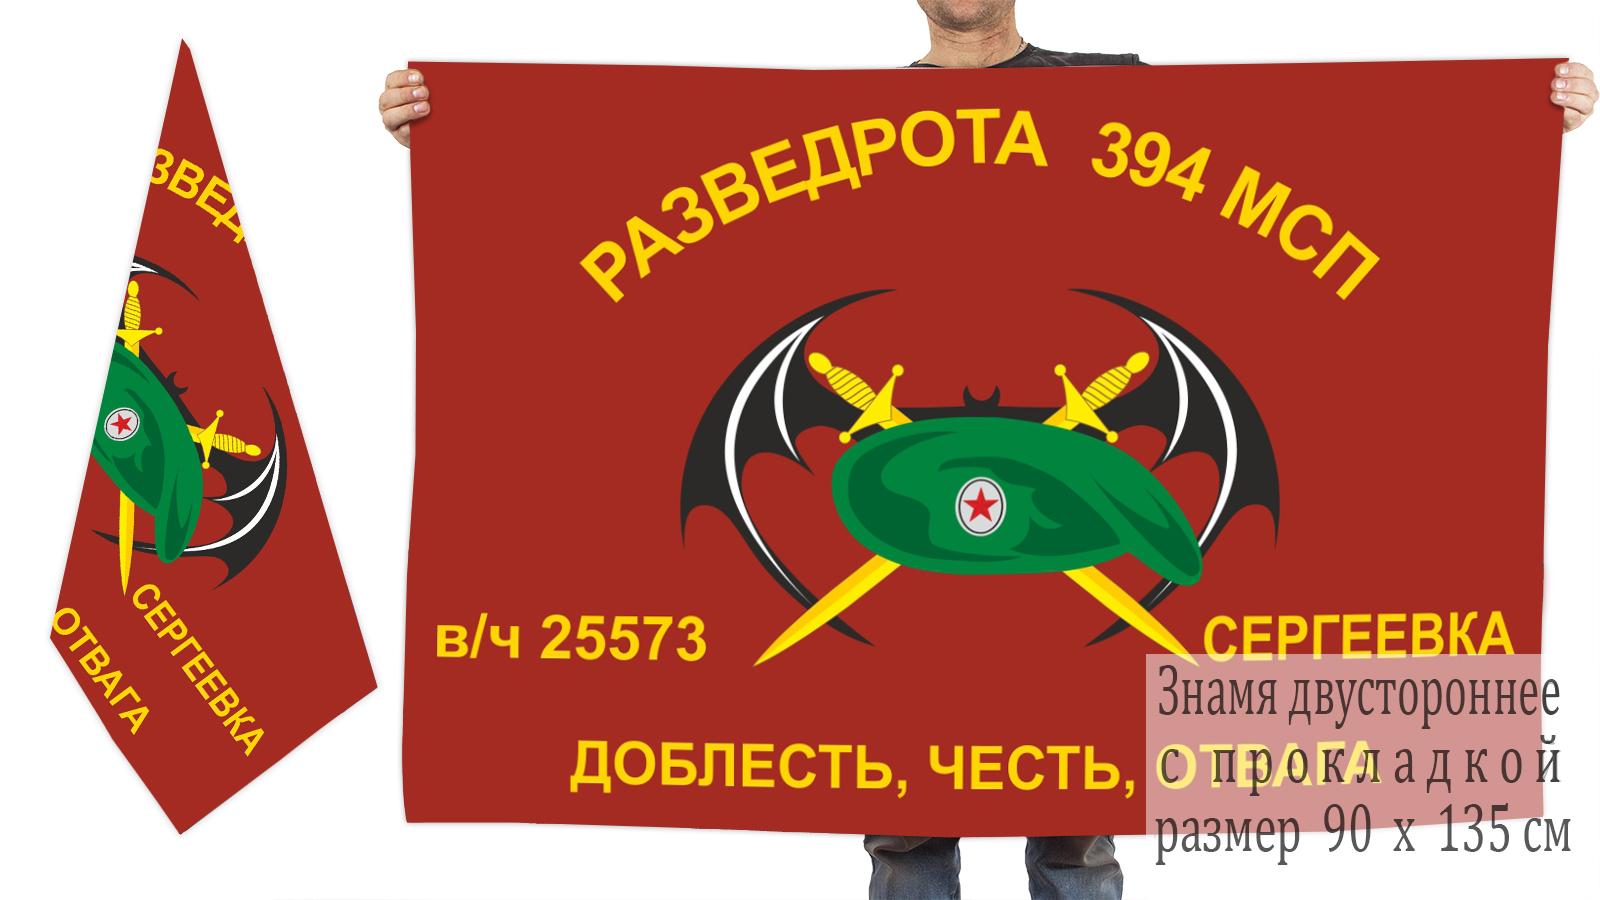 Двусторонний флаг Разведроты 394 МСП